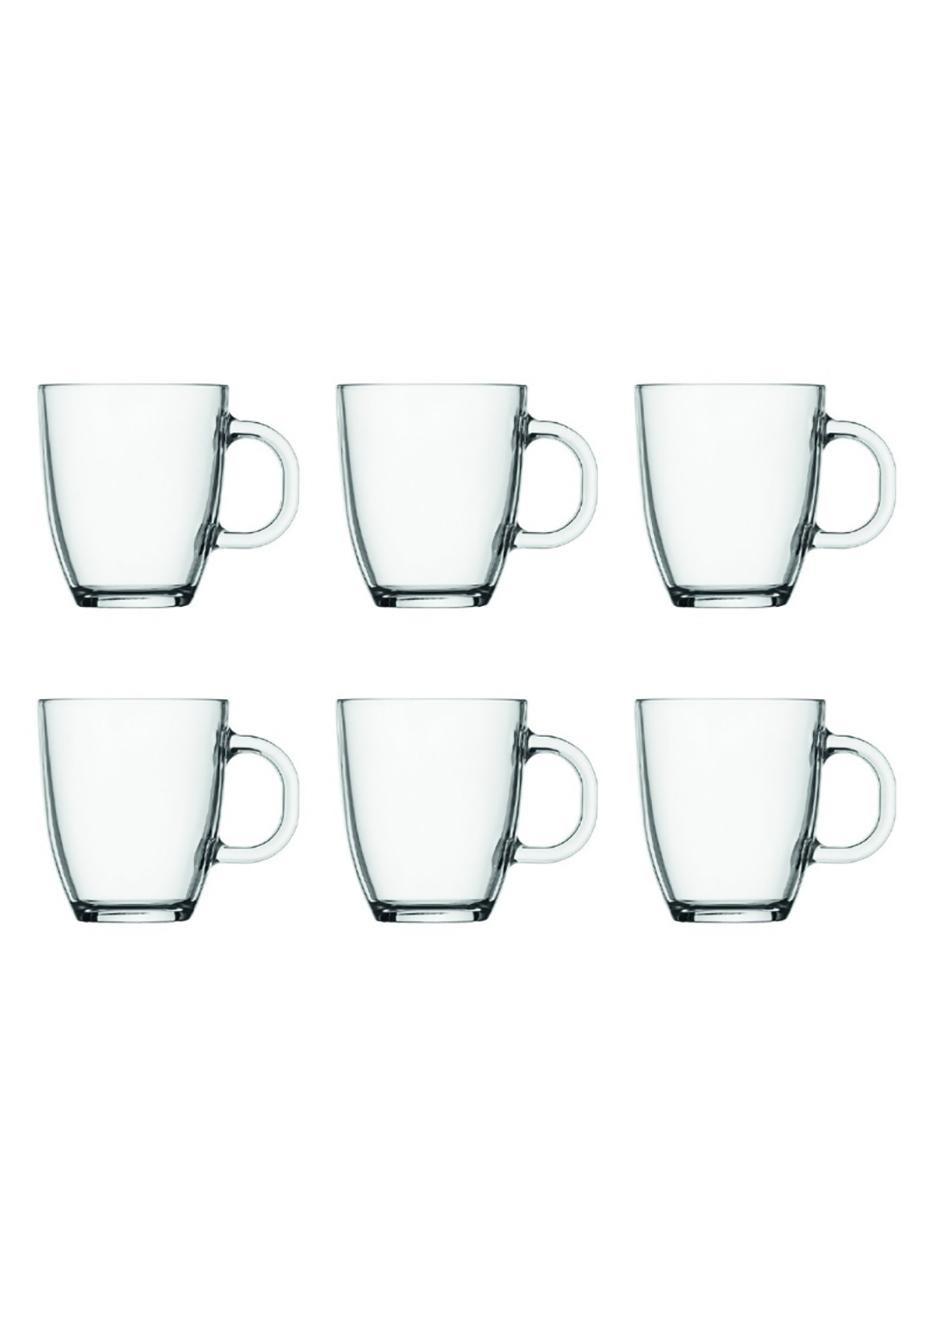 Bistro Set Bodum Coffee 6pc Mug 12oz Kc13TJlF